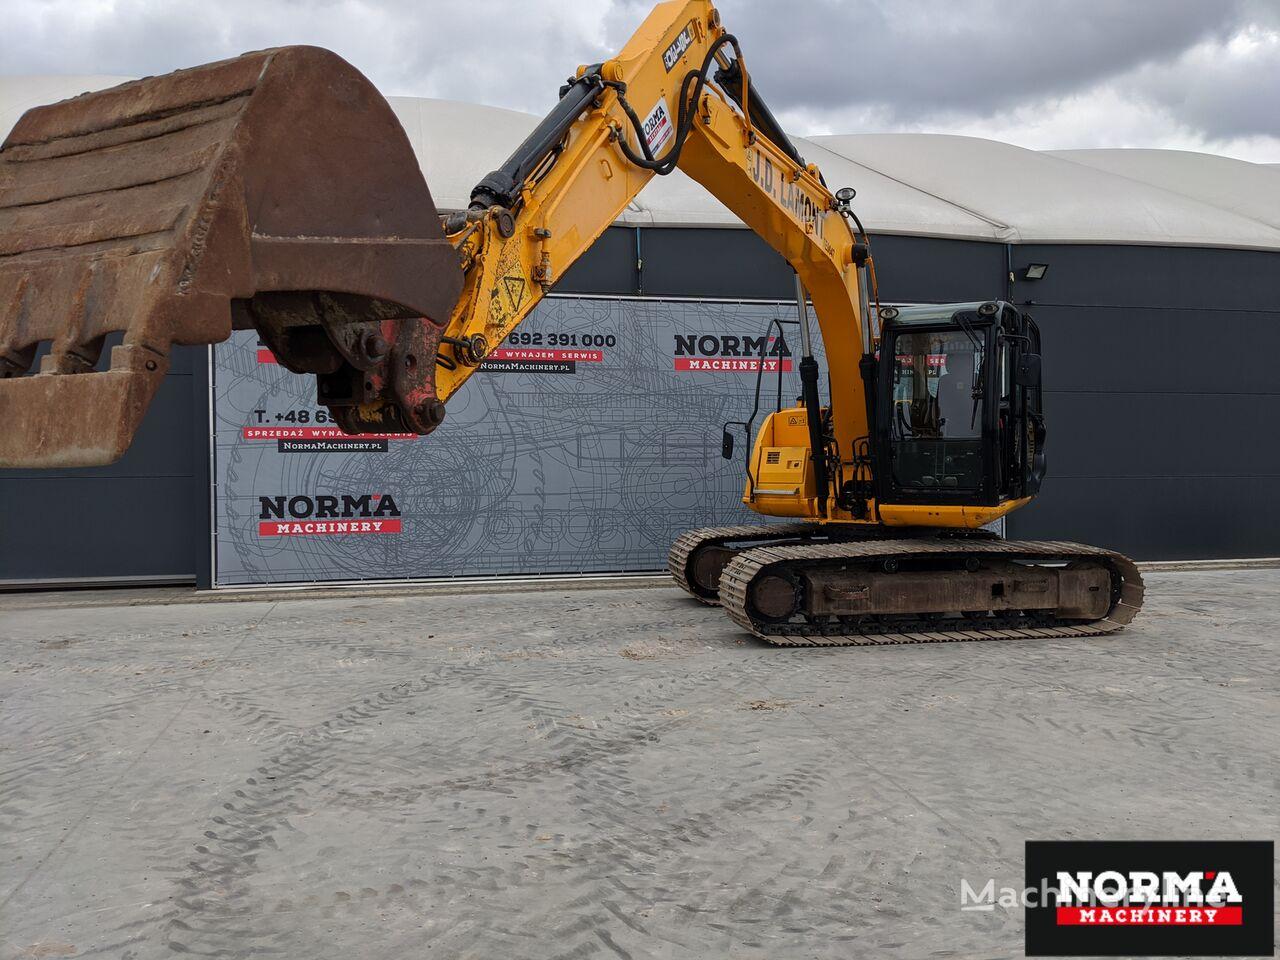 JCB JS 130 LC tracked excavator